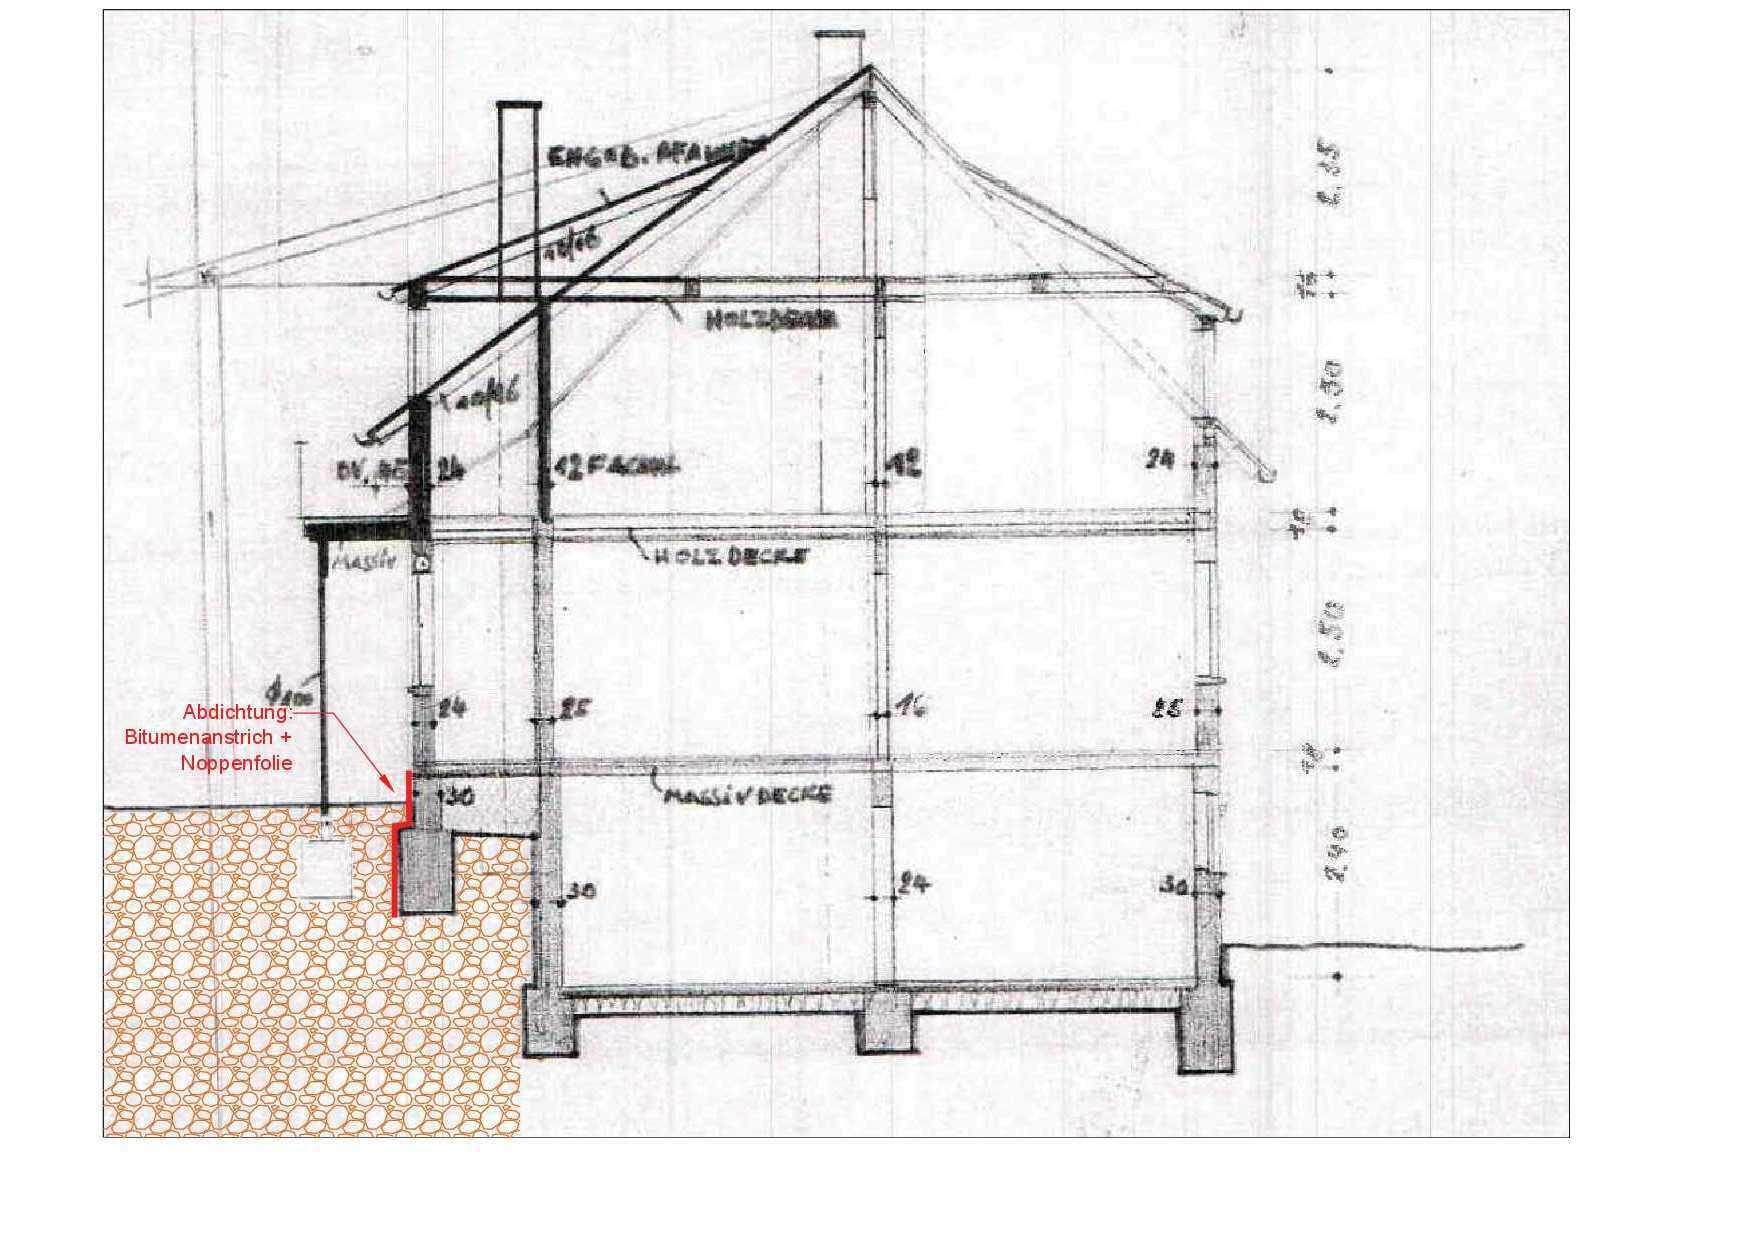 fundament abdichten ohne keller at69 hitoiro. Black Bedroom Furniture Sets. Home Design Ideas